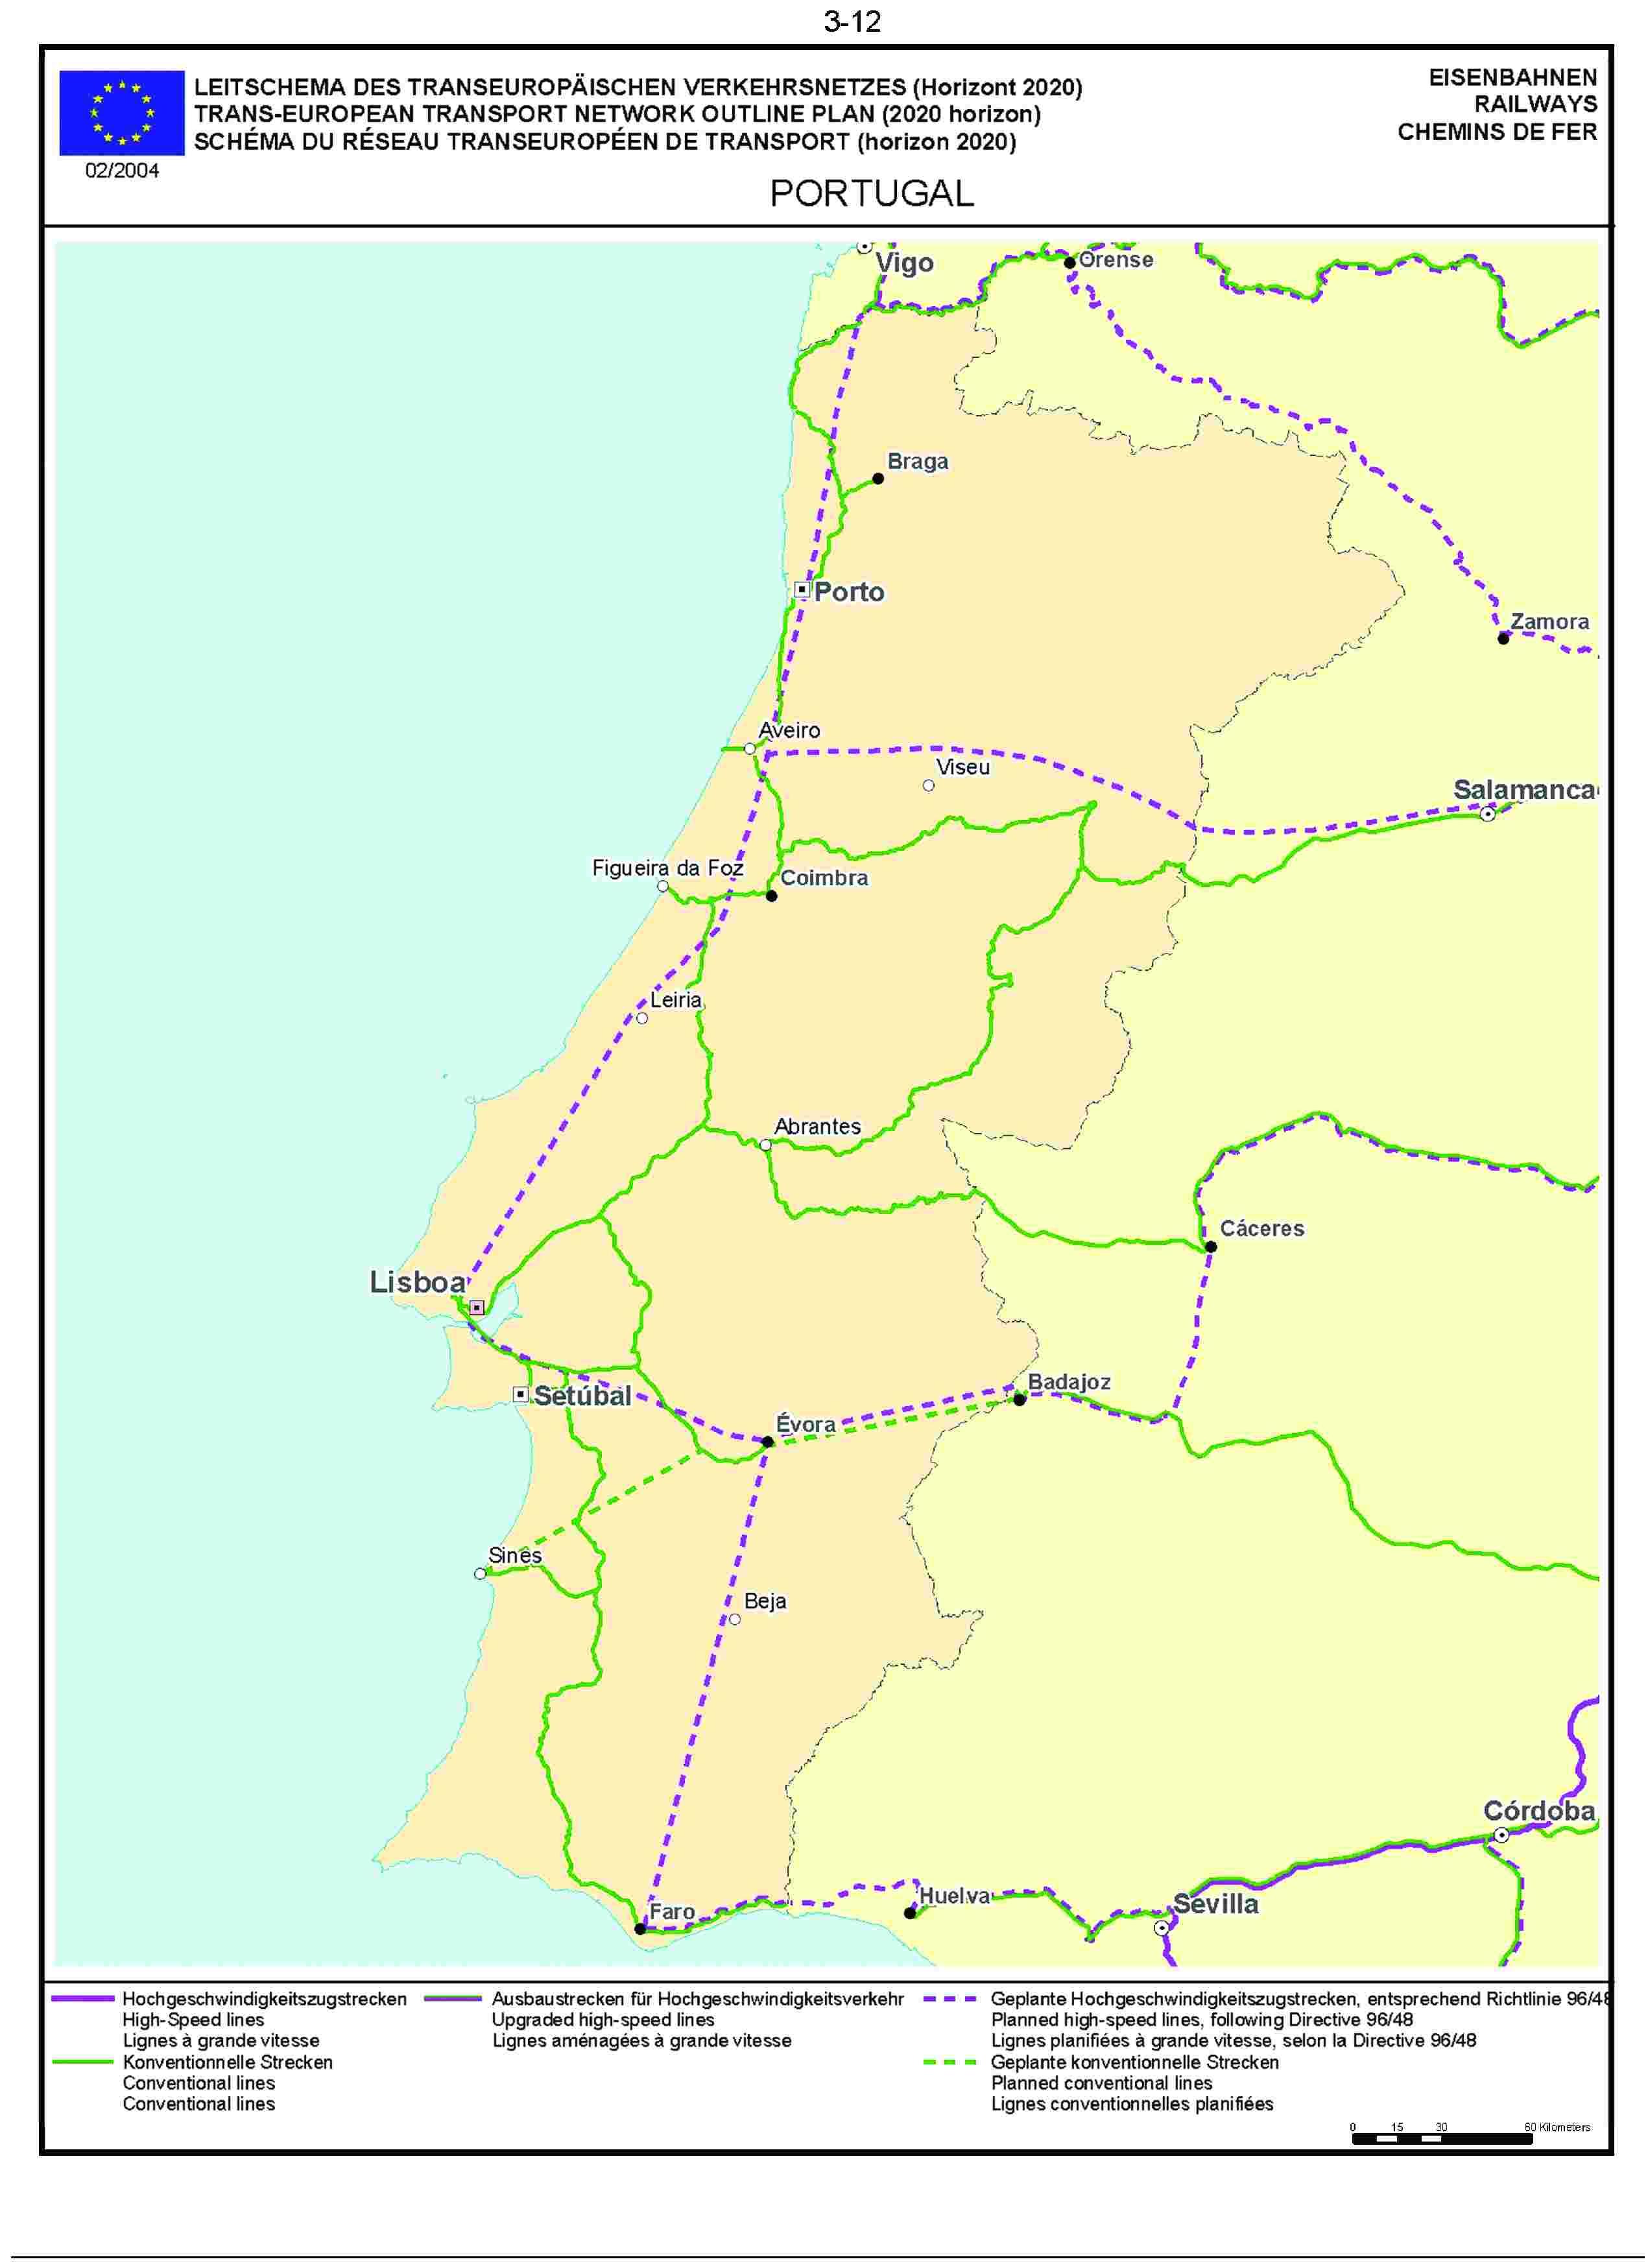 3.12LEITSCHEMA DES TRANSEUROPÄISCHEN VERKEHRSNETZES (Horizont 2020) EISENBAHNENTRANS-EUROPEAN TRANSPORT NETWORK OUTLINE PLAN (2020 horizon) RAILWAYSSCHÉMA DU RÉSEAU TRANSEUROPÉEN DE TRANSPORT (horizon 2020) CHEMINS DE FER02/2004PORTUGAL